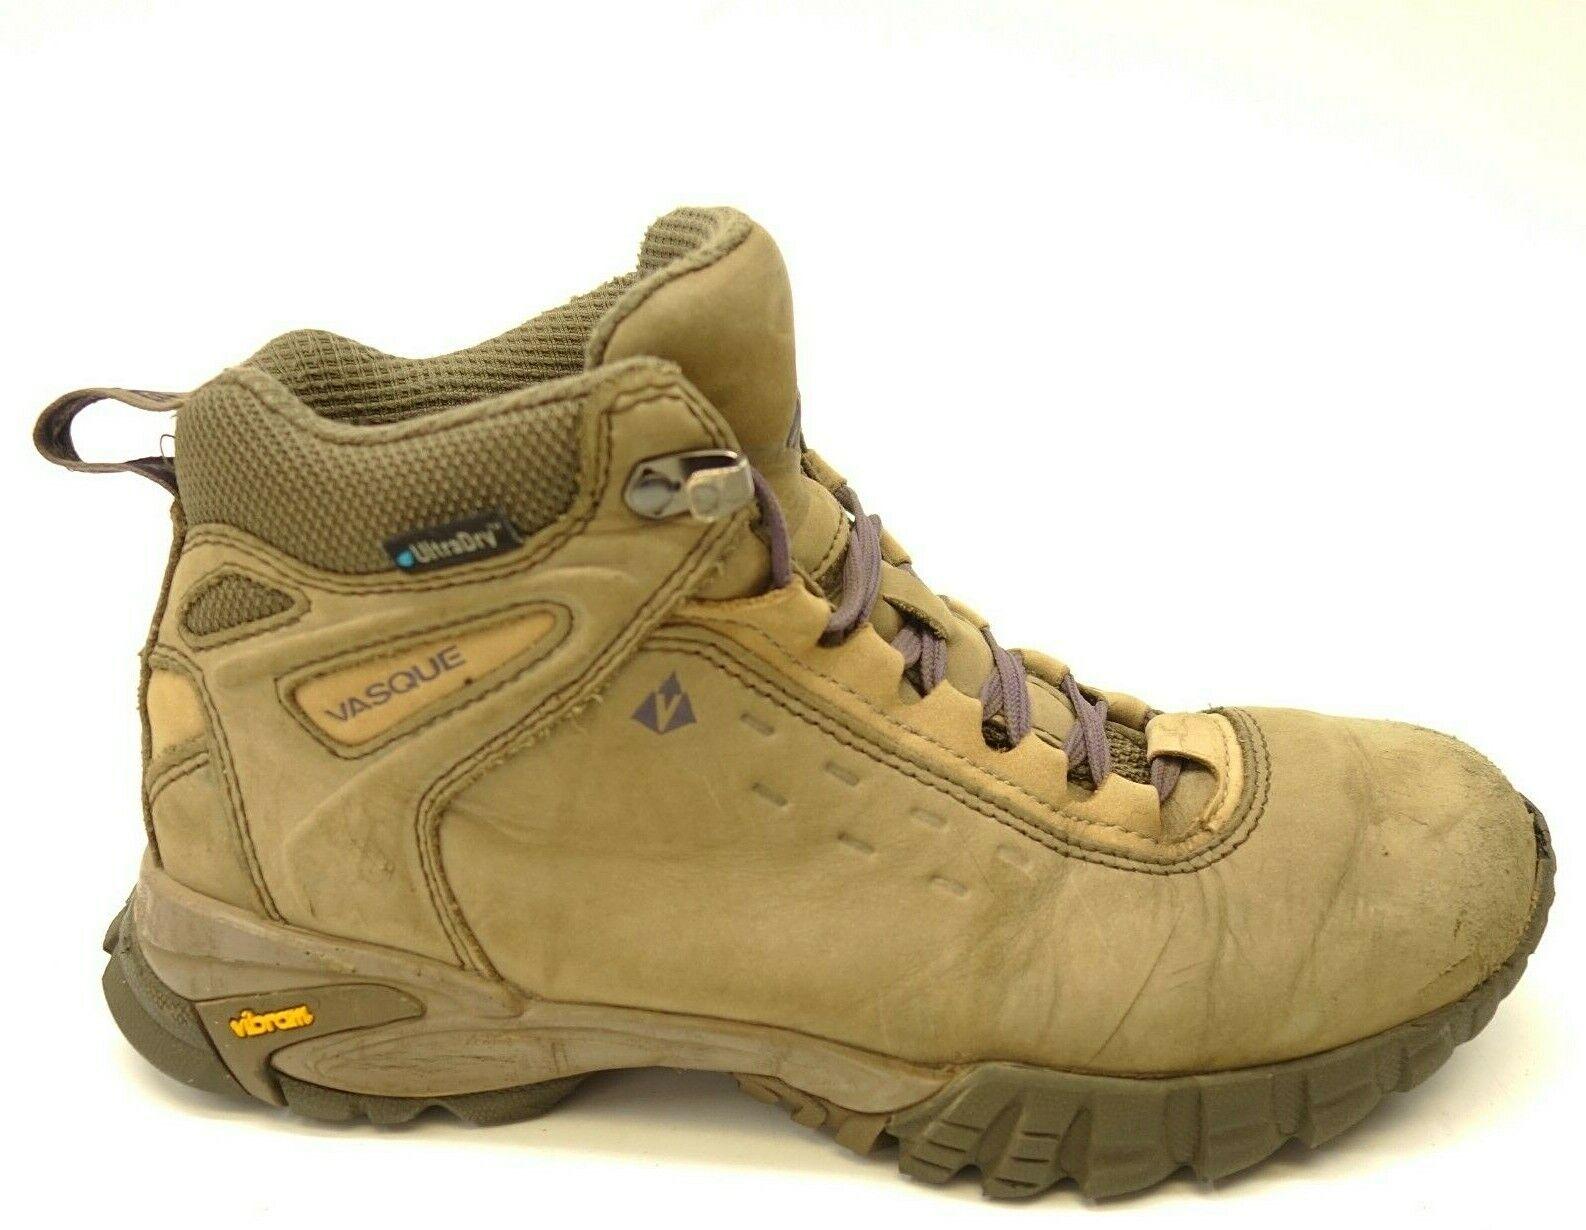 Vasque Talus Trek Niedrig US 8 Eu 38,5 Ultradry Leder Wandern Damen Schuhe